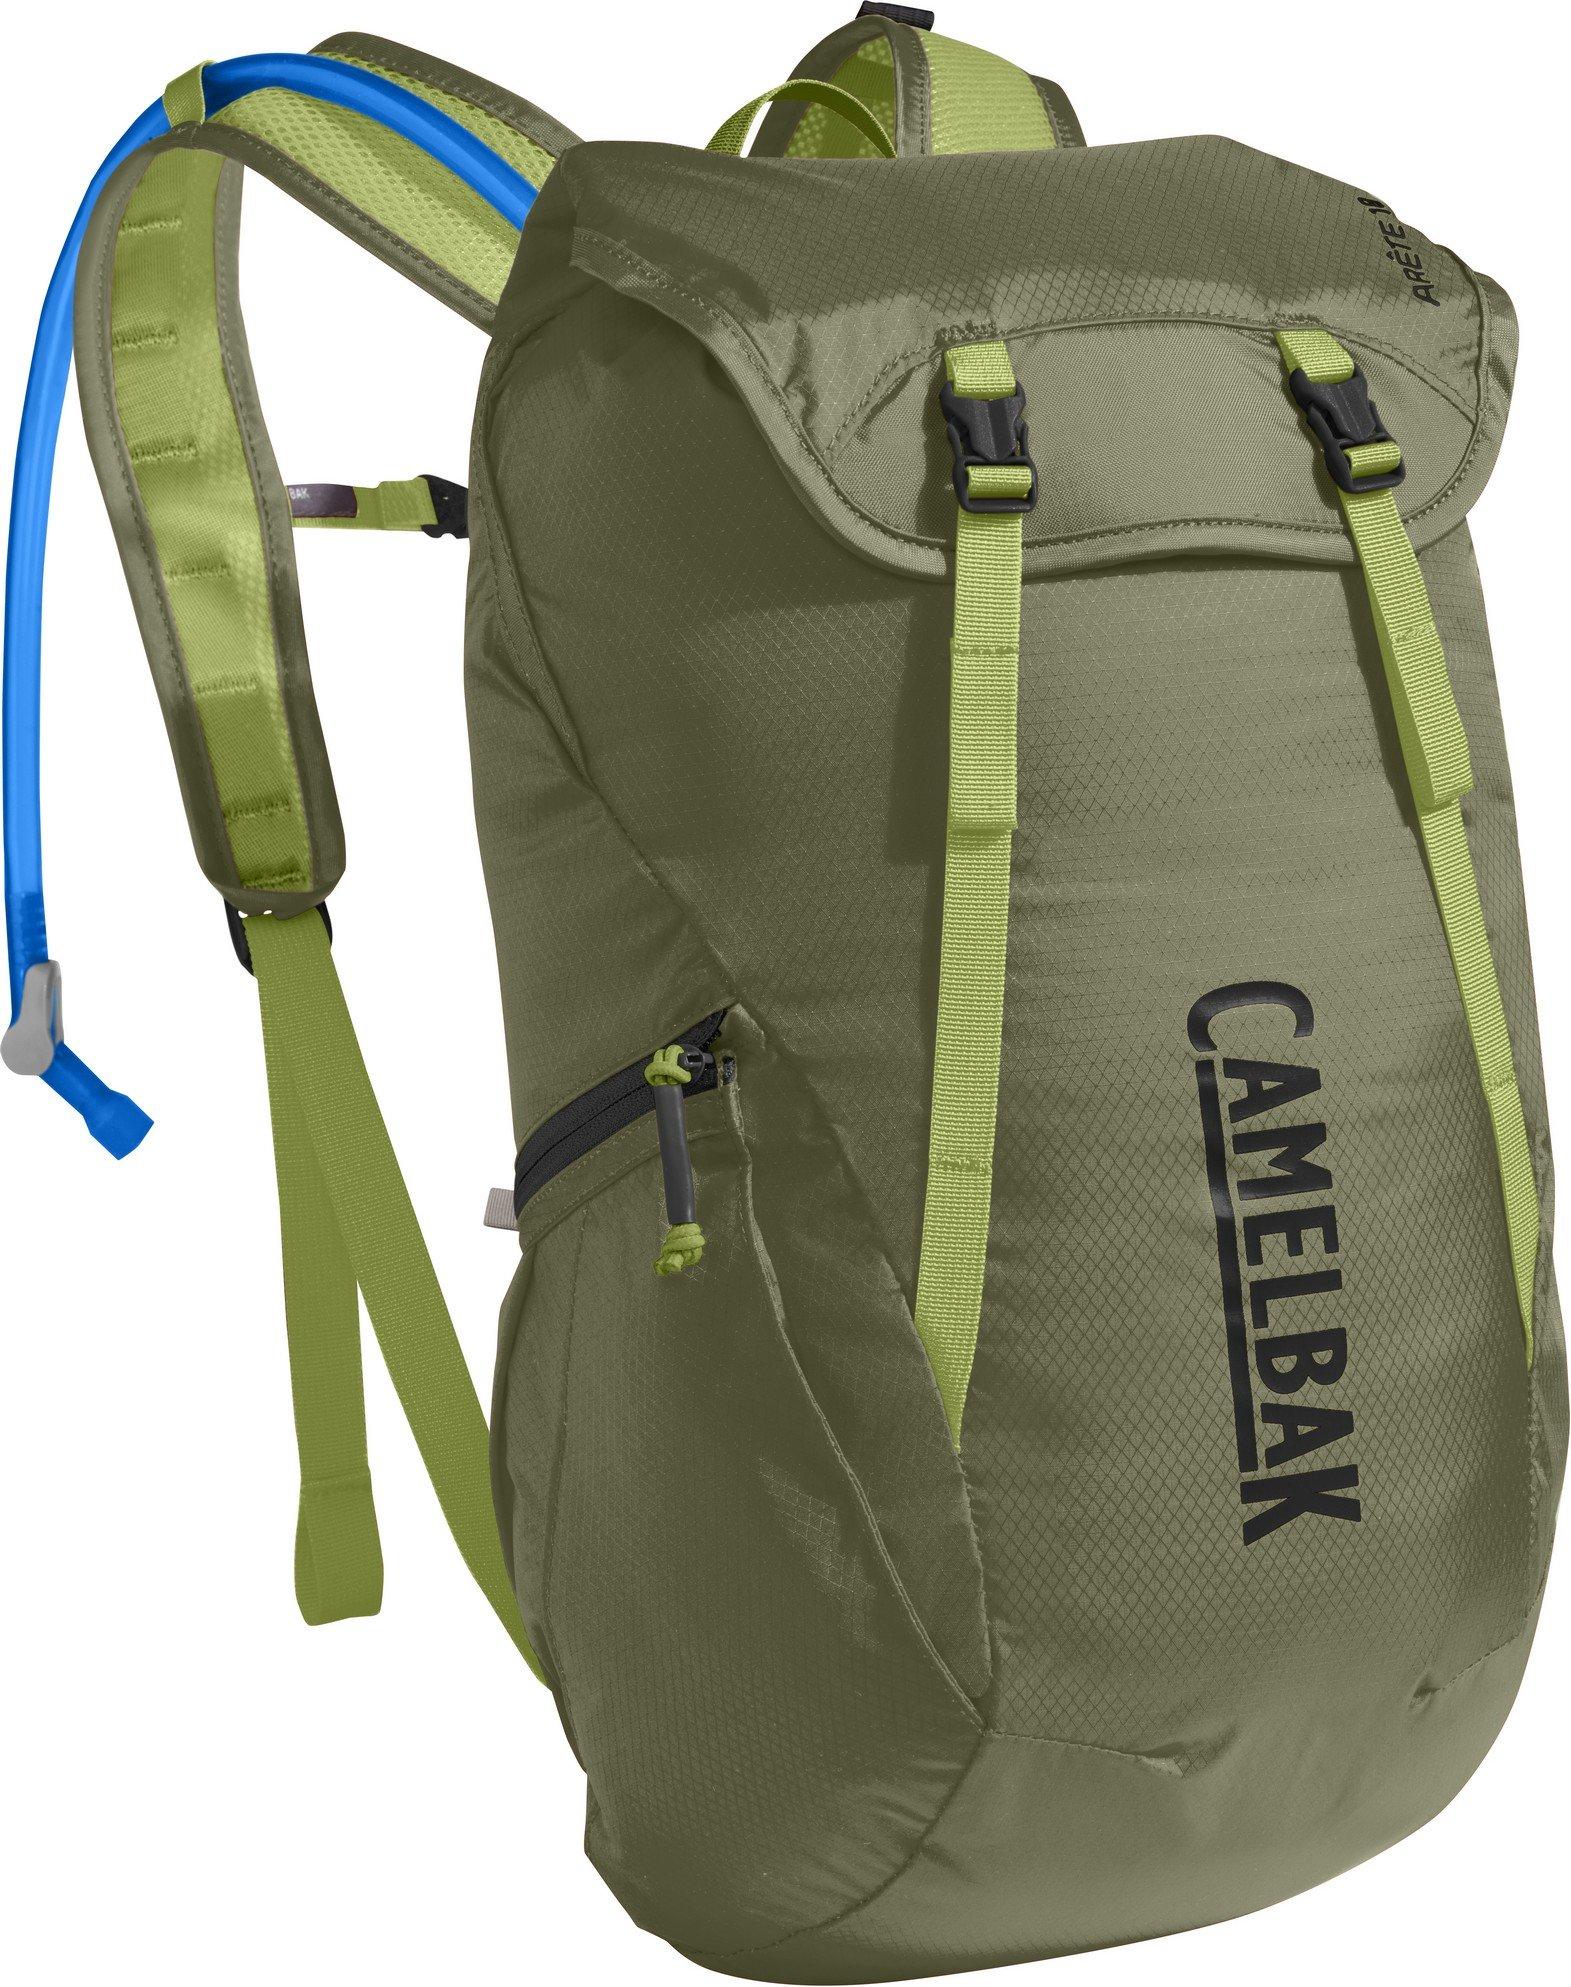 CamelBak Arete 18 Crux Reservoir Hydration Pack, Lichen Green/Dark Citron, 1.5 L/50 oz